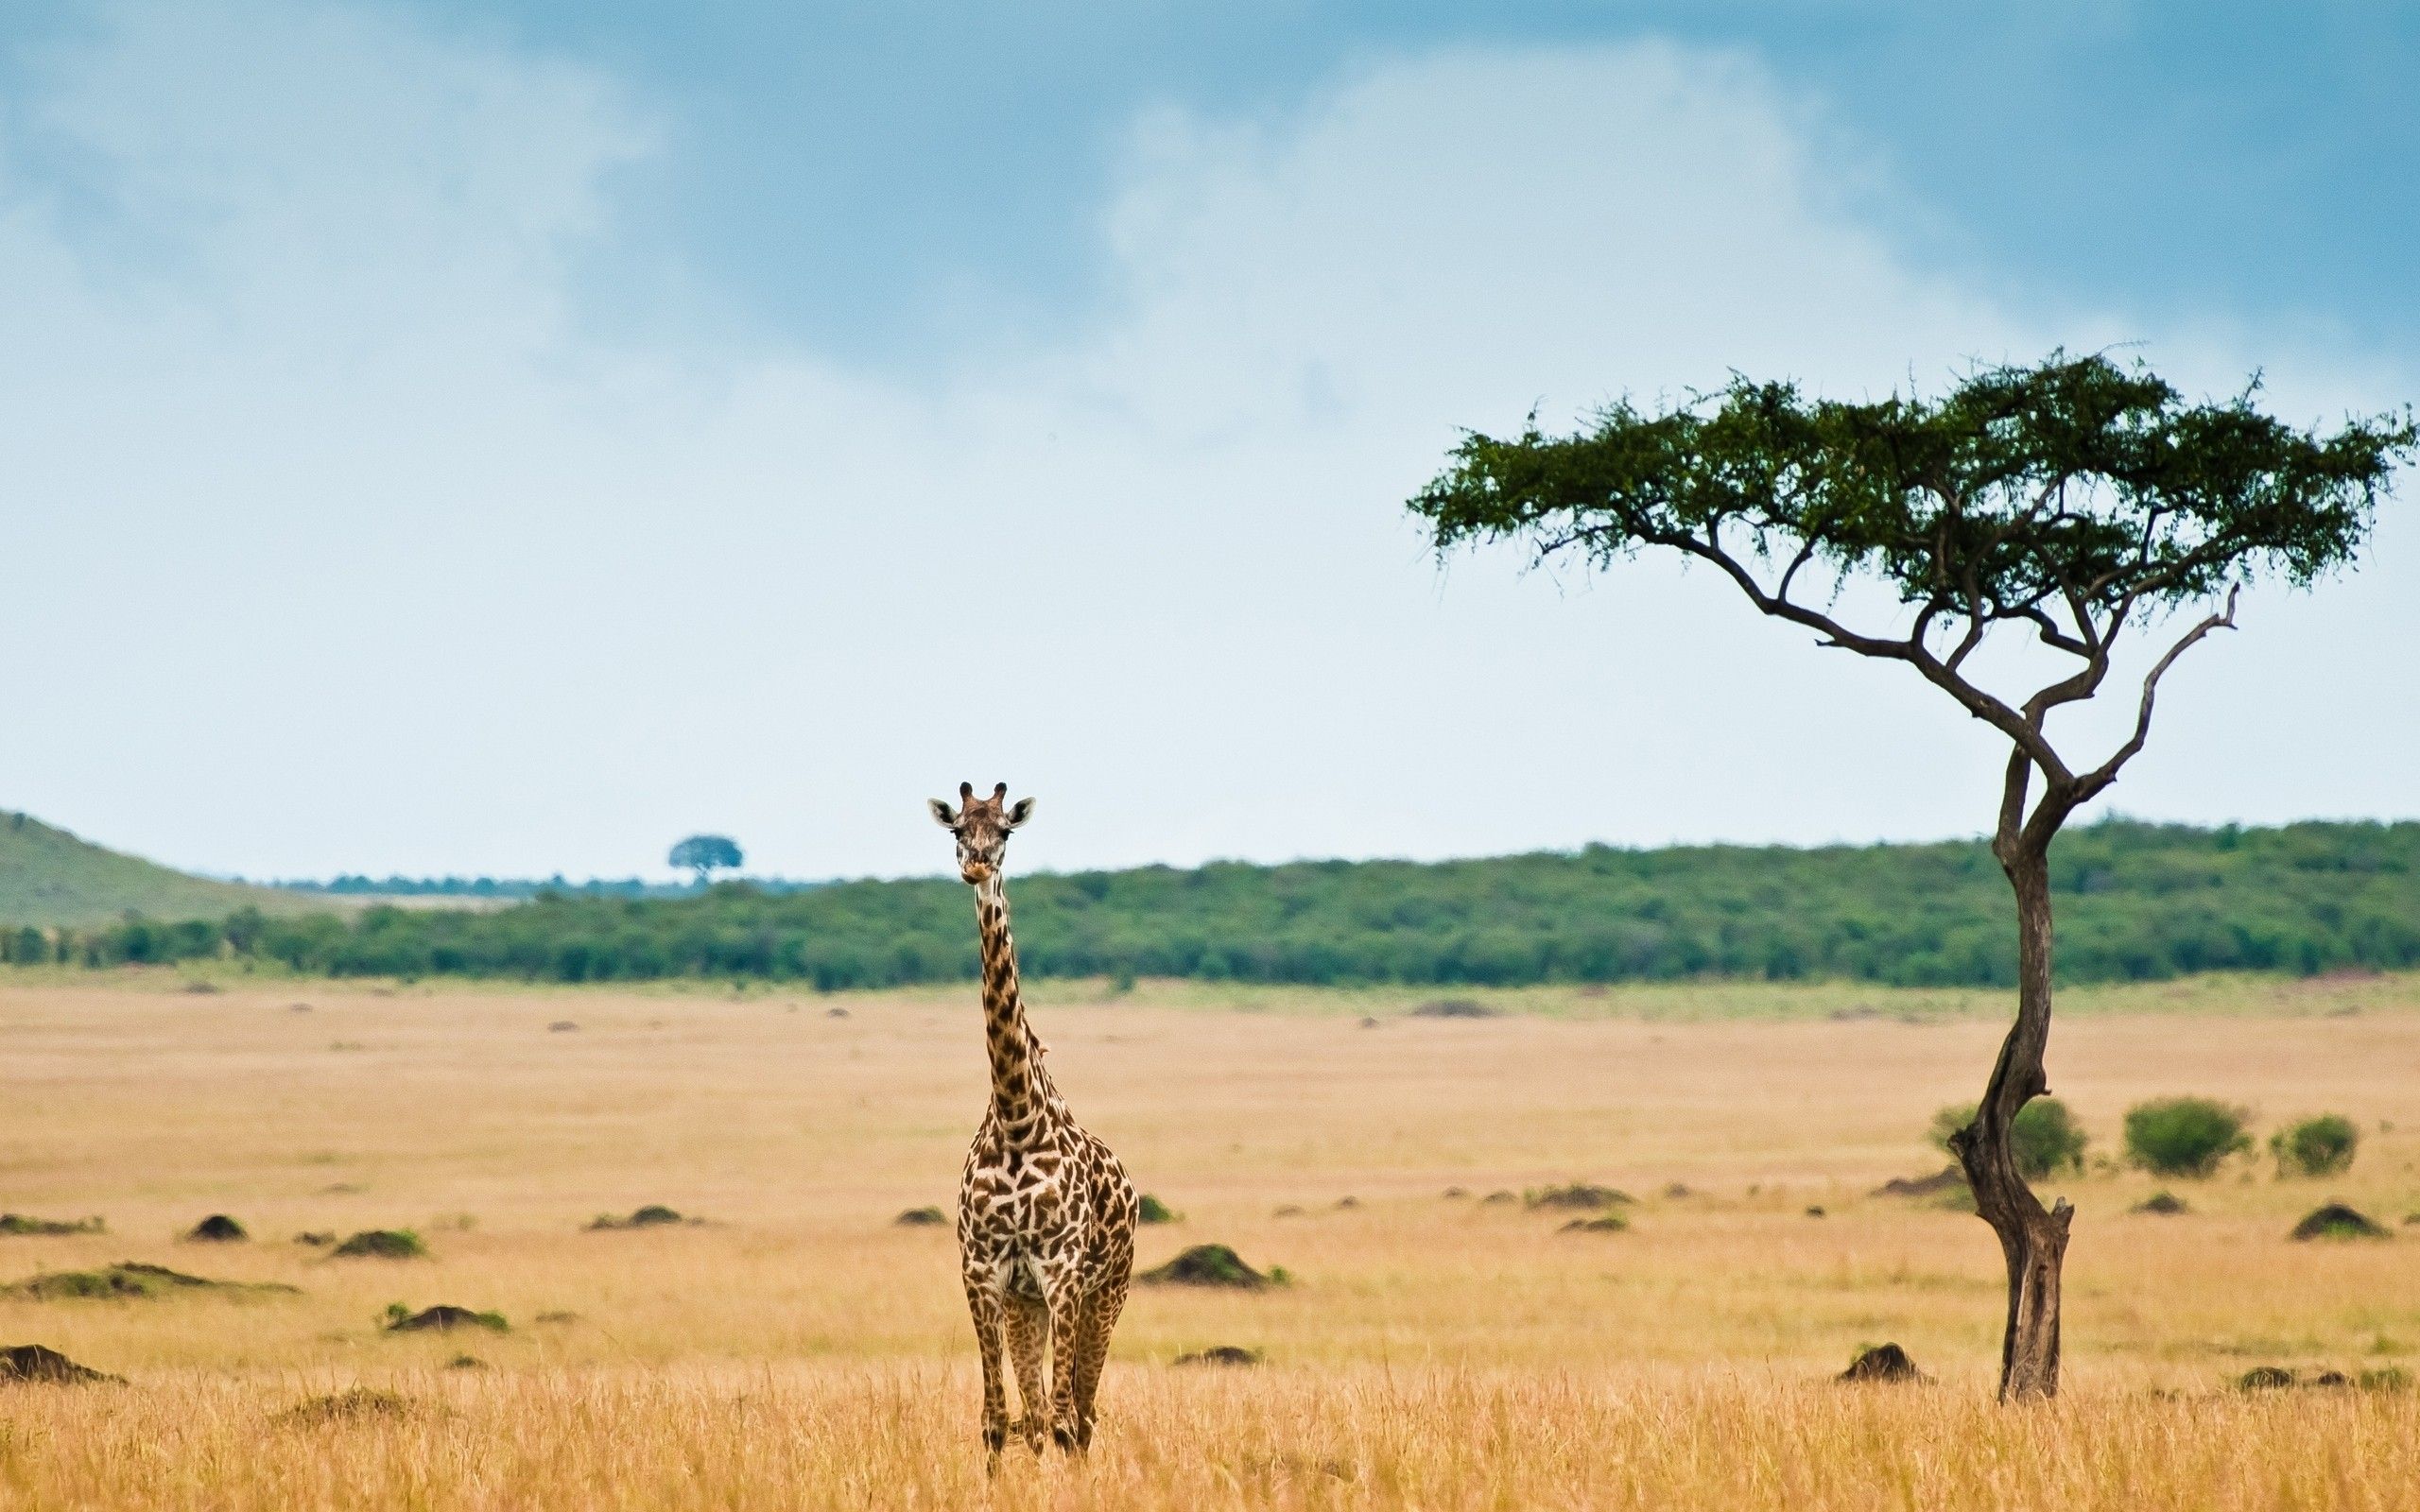 Giraffe Savannah Desert